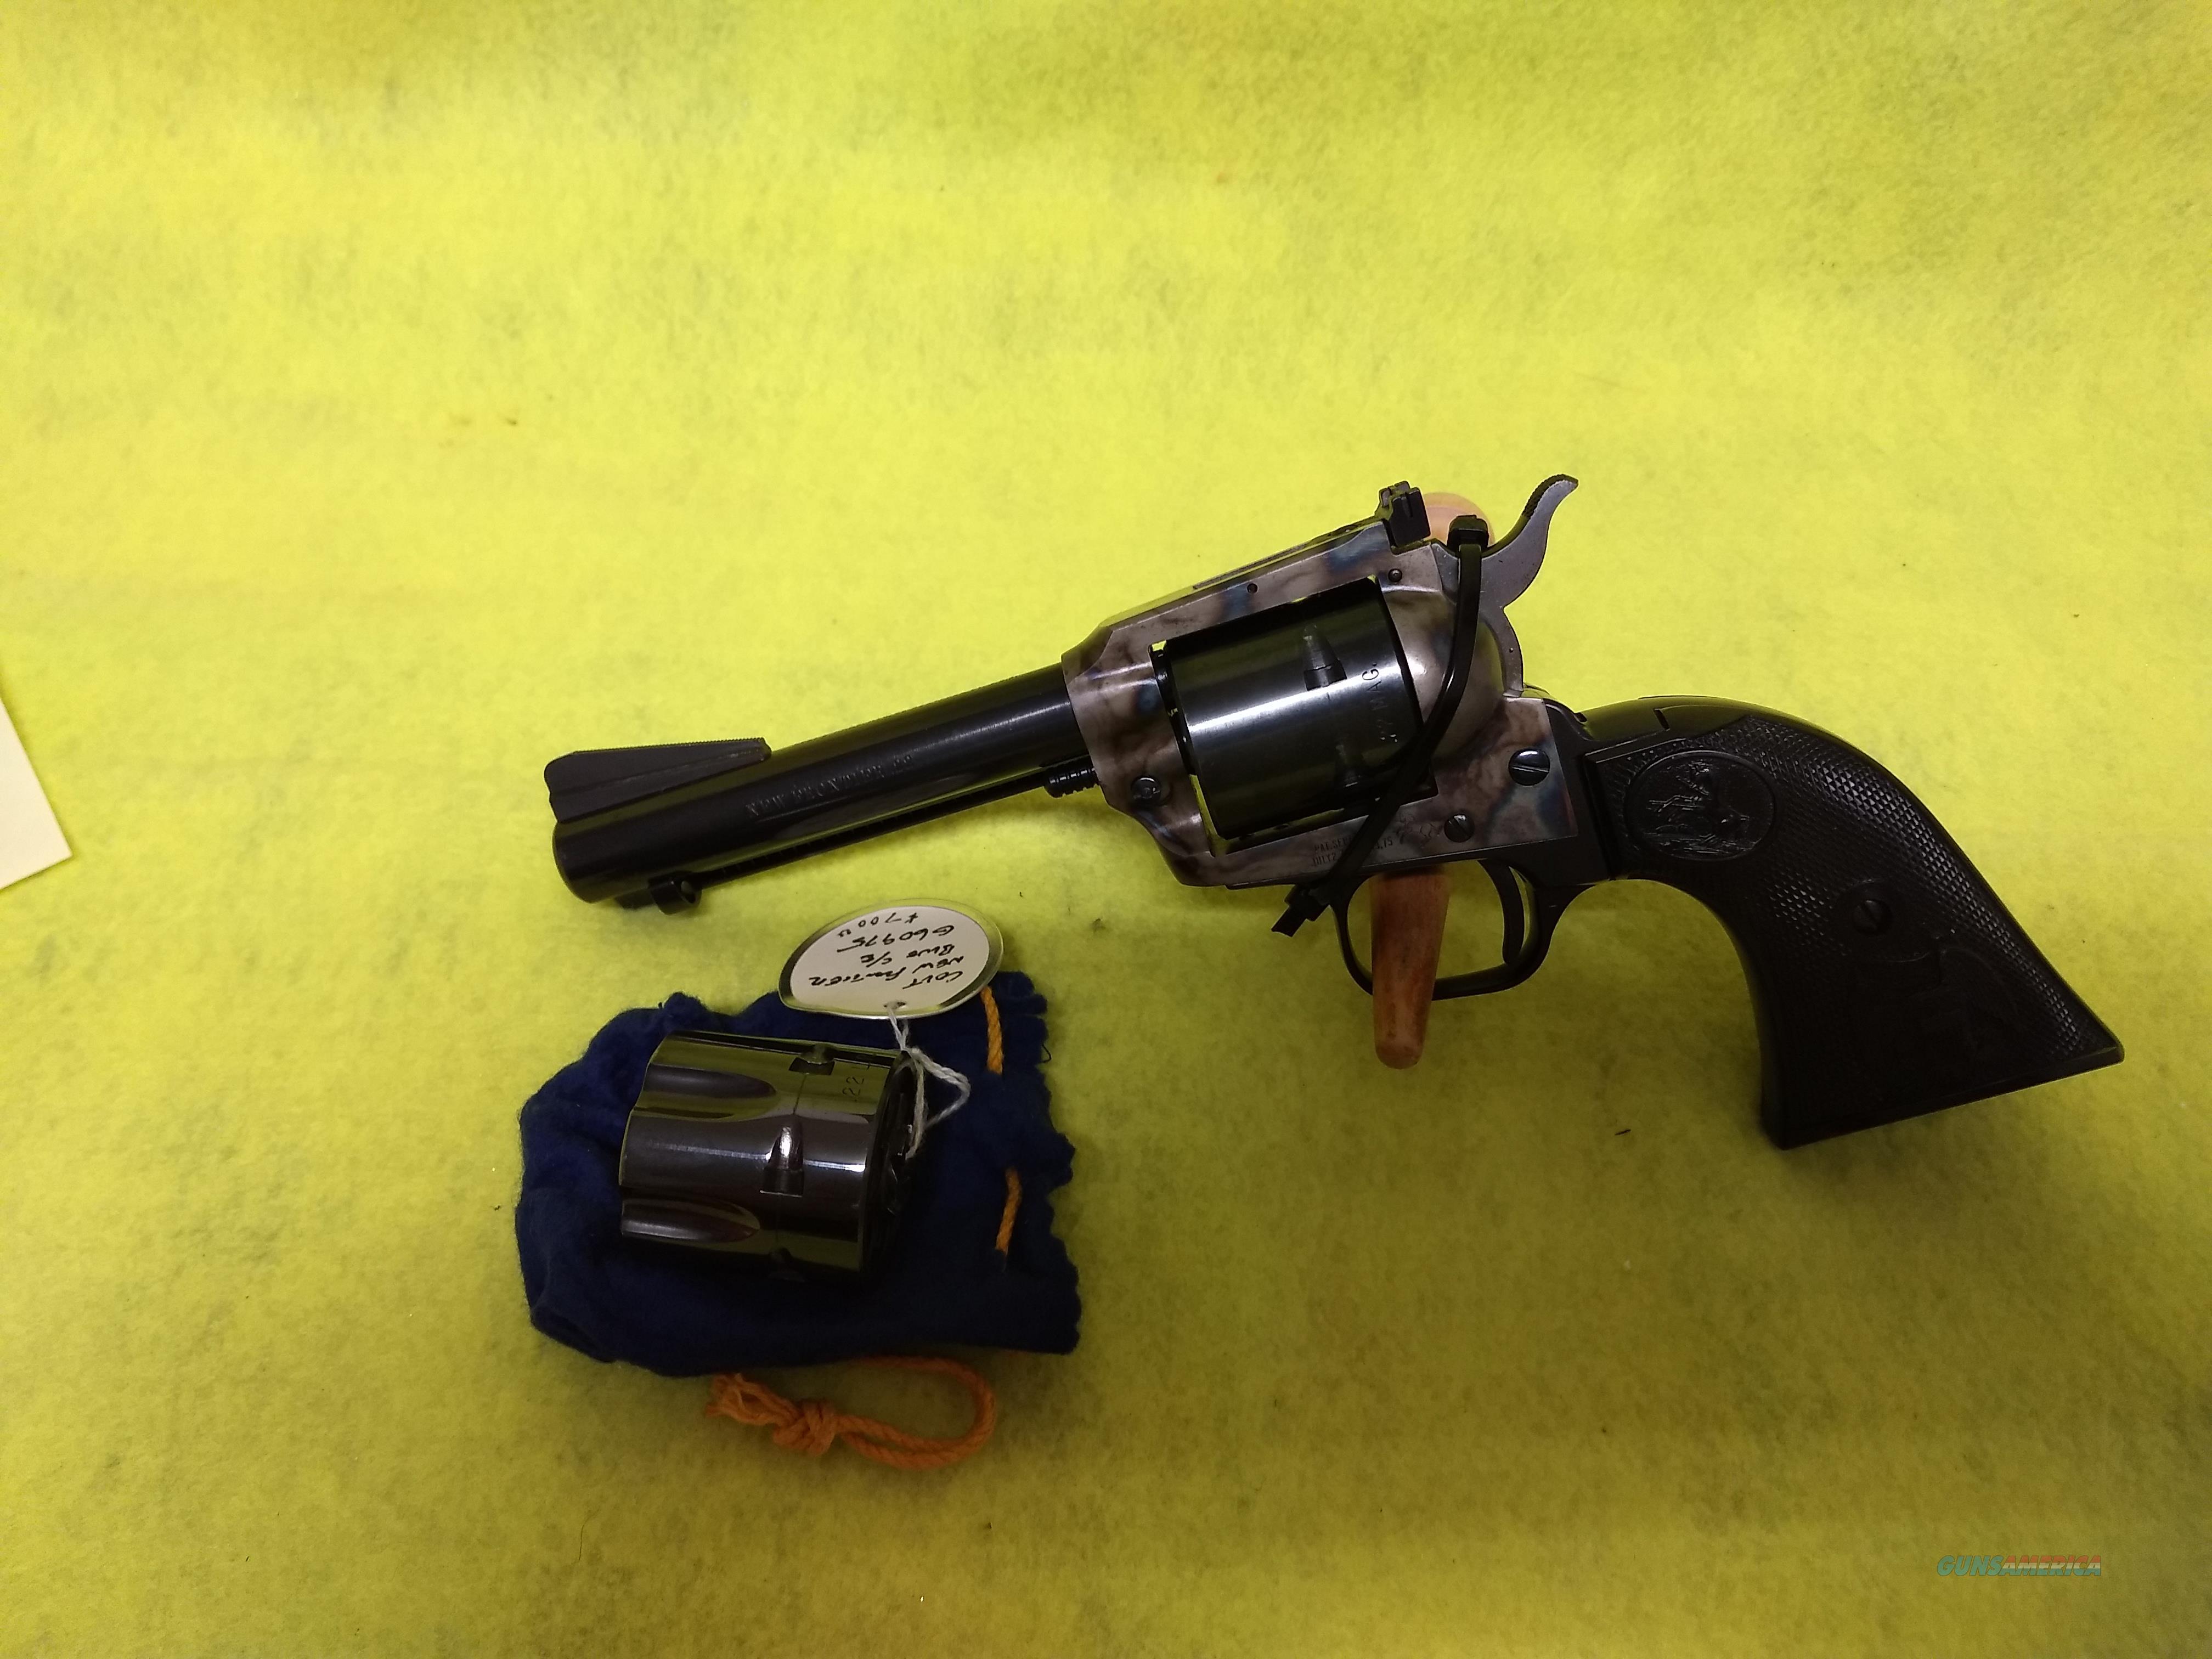 Colt New Frontier dual cylinder 22LR & 22MAGNUM  Guns > Pistols > Colt Single Action Revolvers - Modern (22 Cal.)